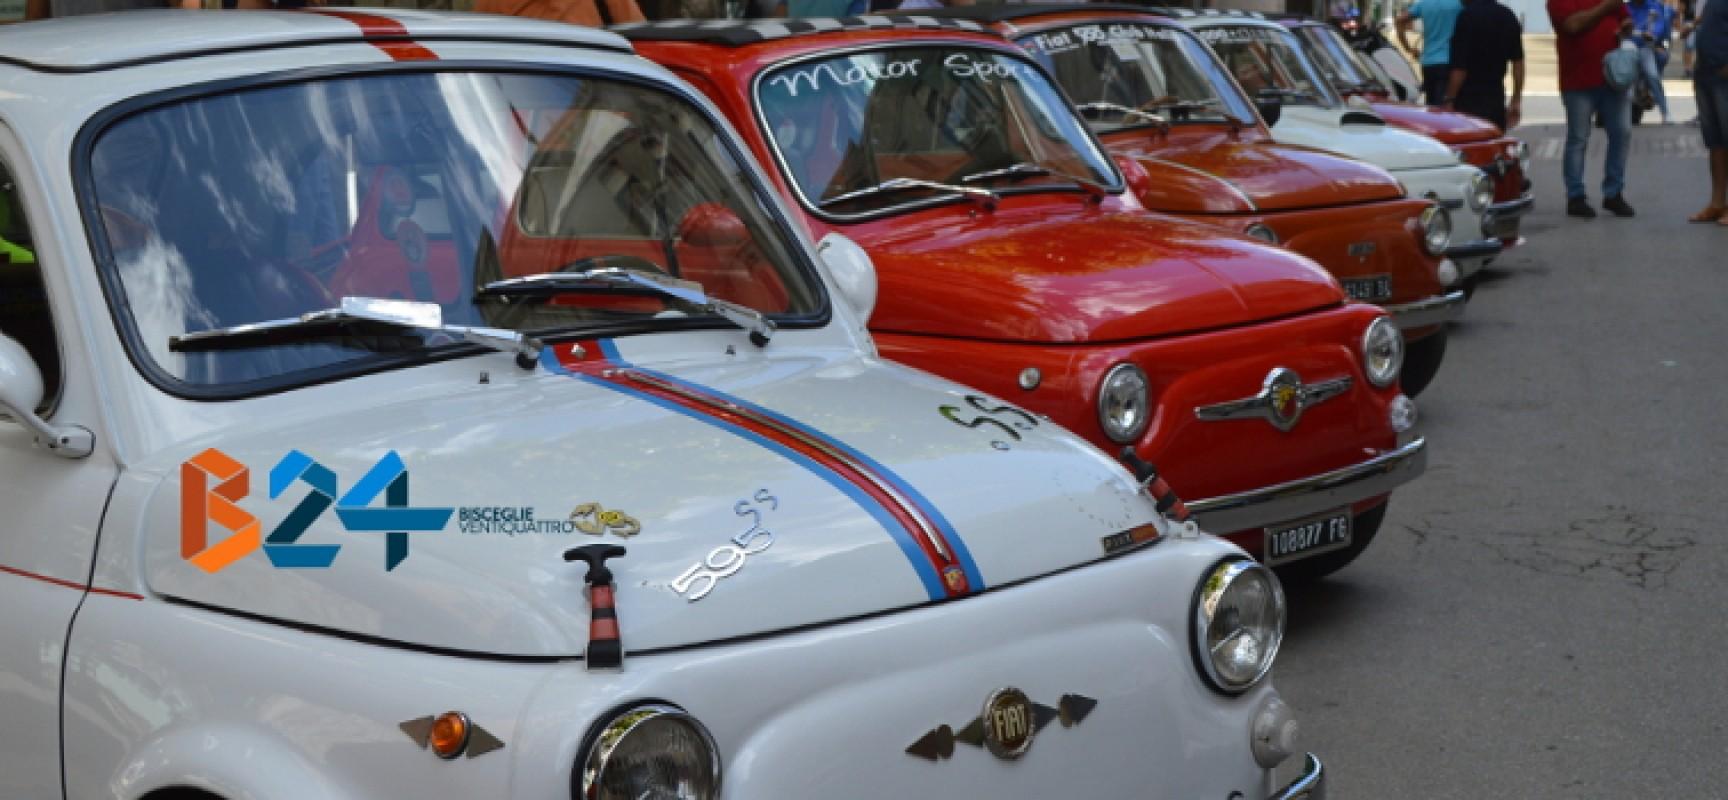 Fiat 500 club, Meeting internazionale del Sud Italia nel weekend